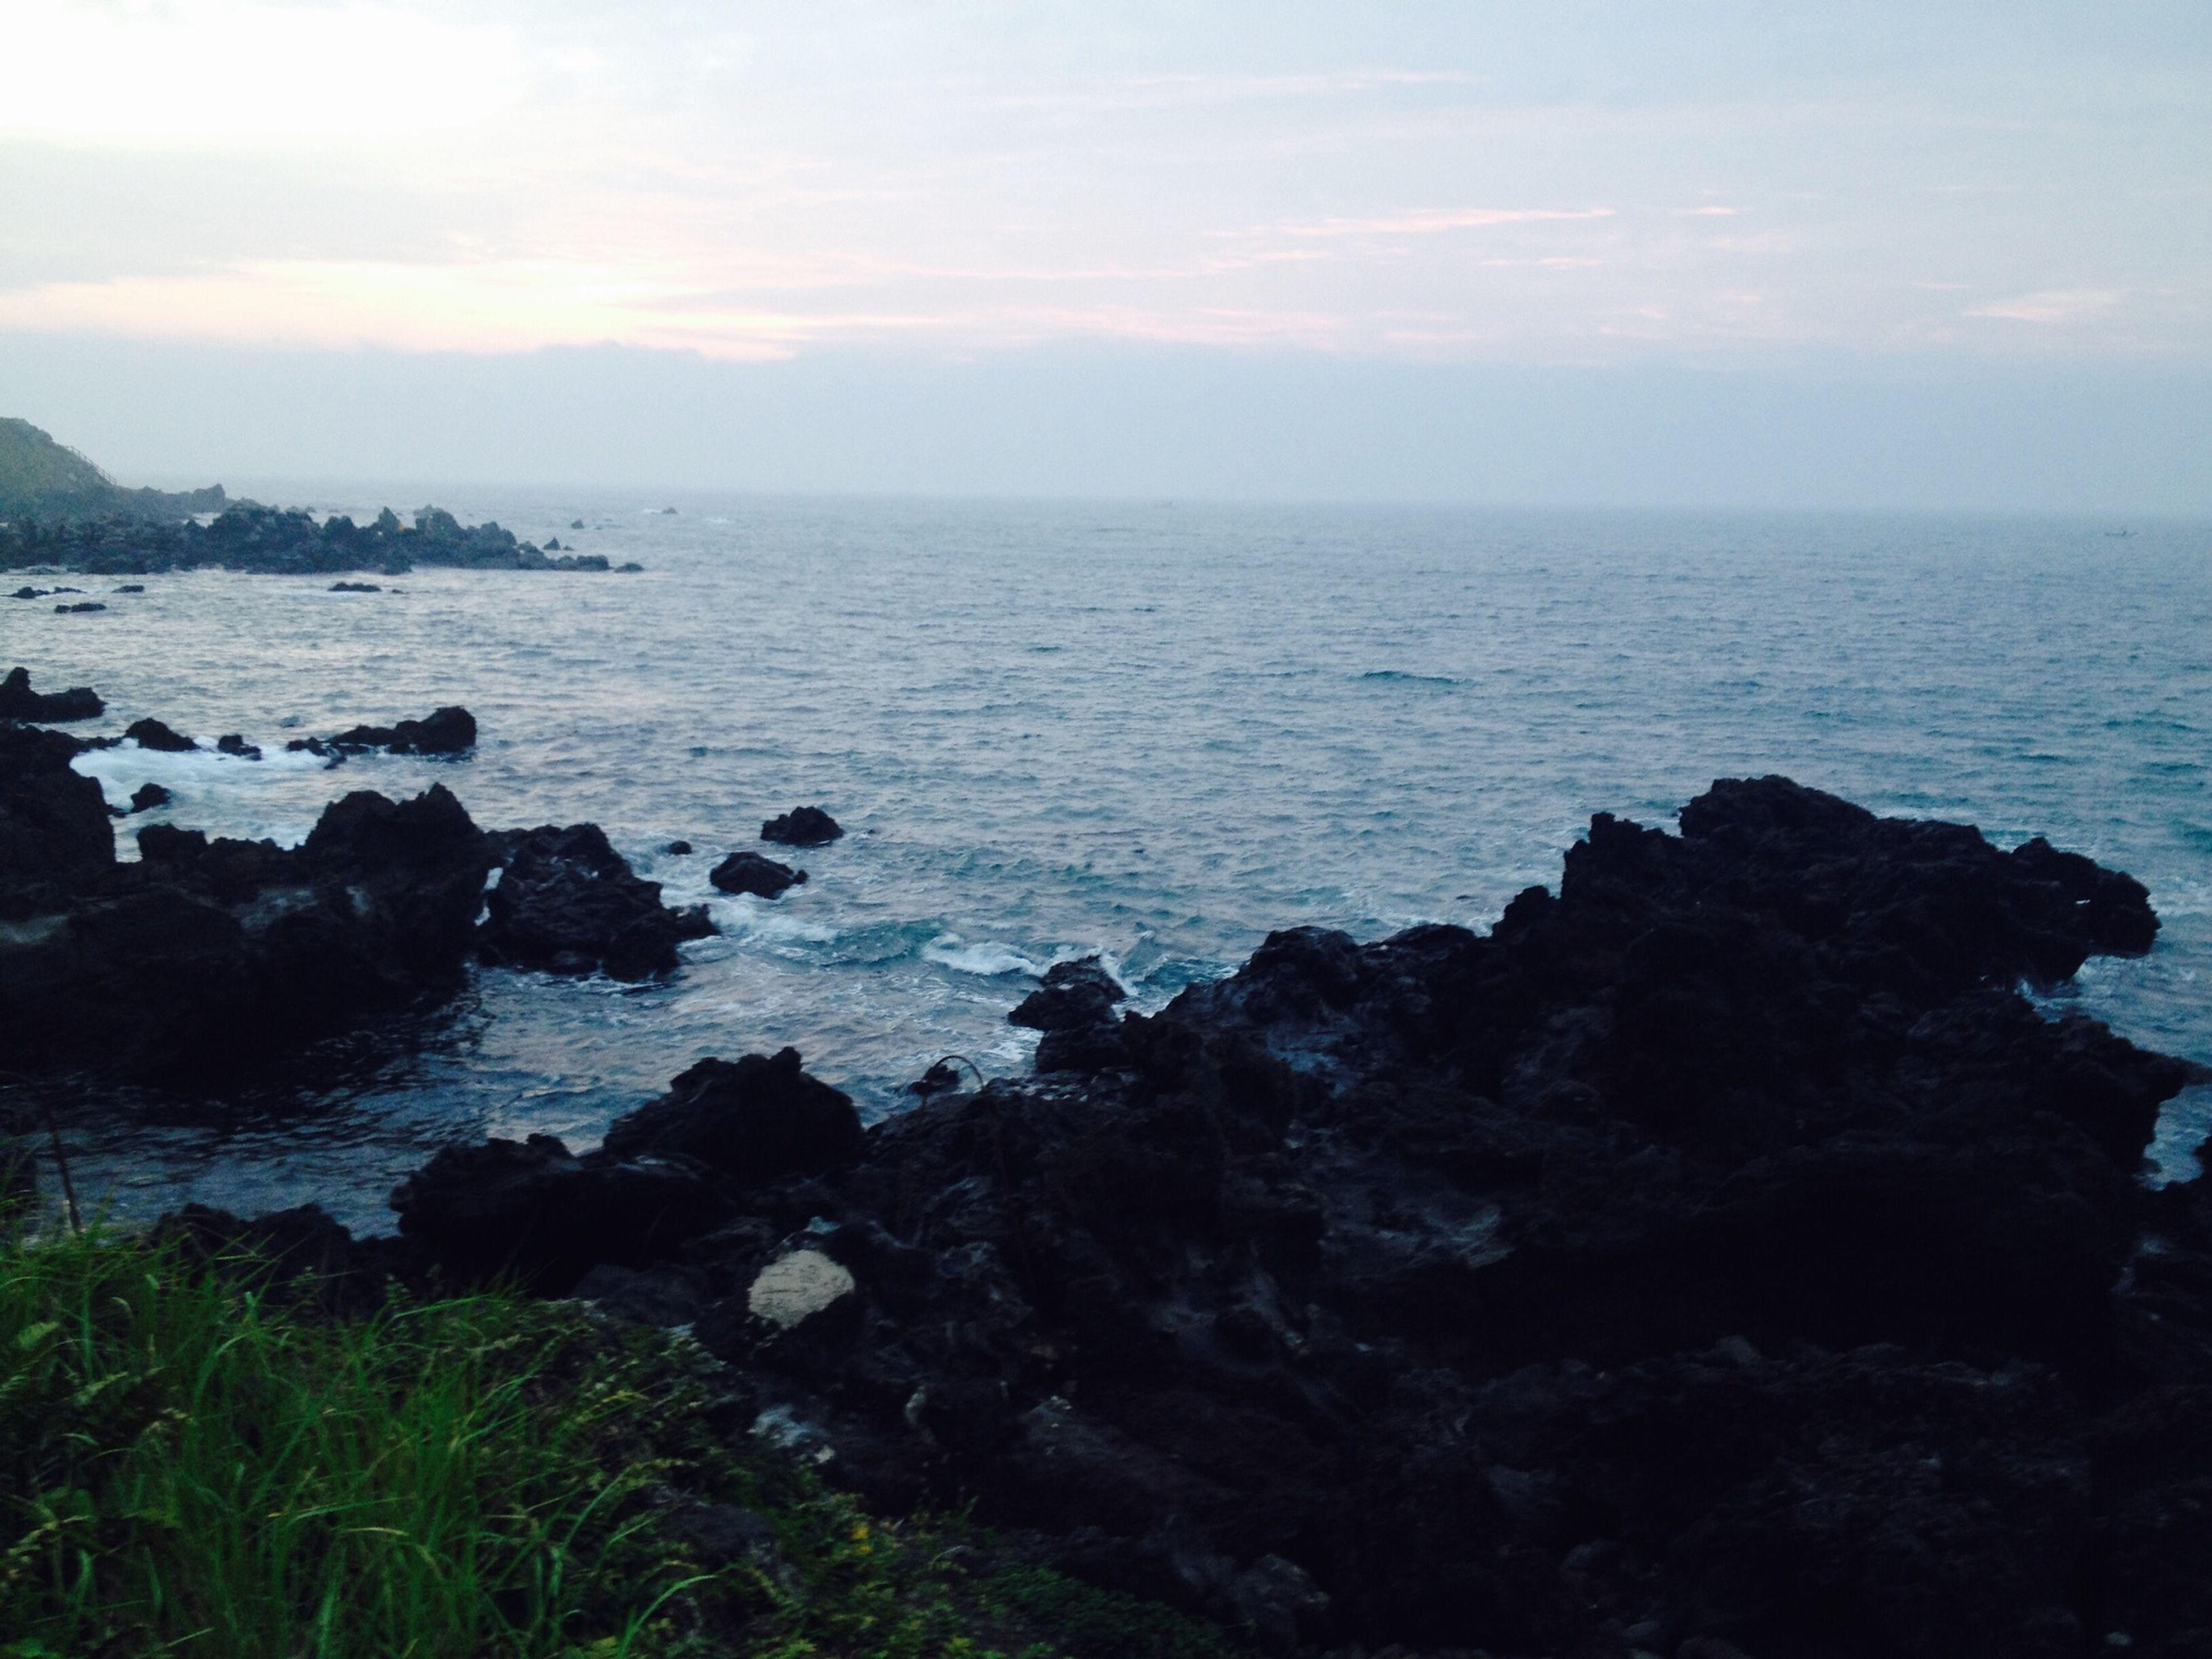 sea, water, horizon over water, scenics, tranquil scene, tranquility, beauty in nature, sky, rock - object, nature, rock formation, rock, idyllic, cliff, coastline, shore, beach, remote, outdoors, non-urban scene